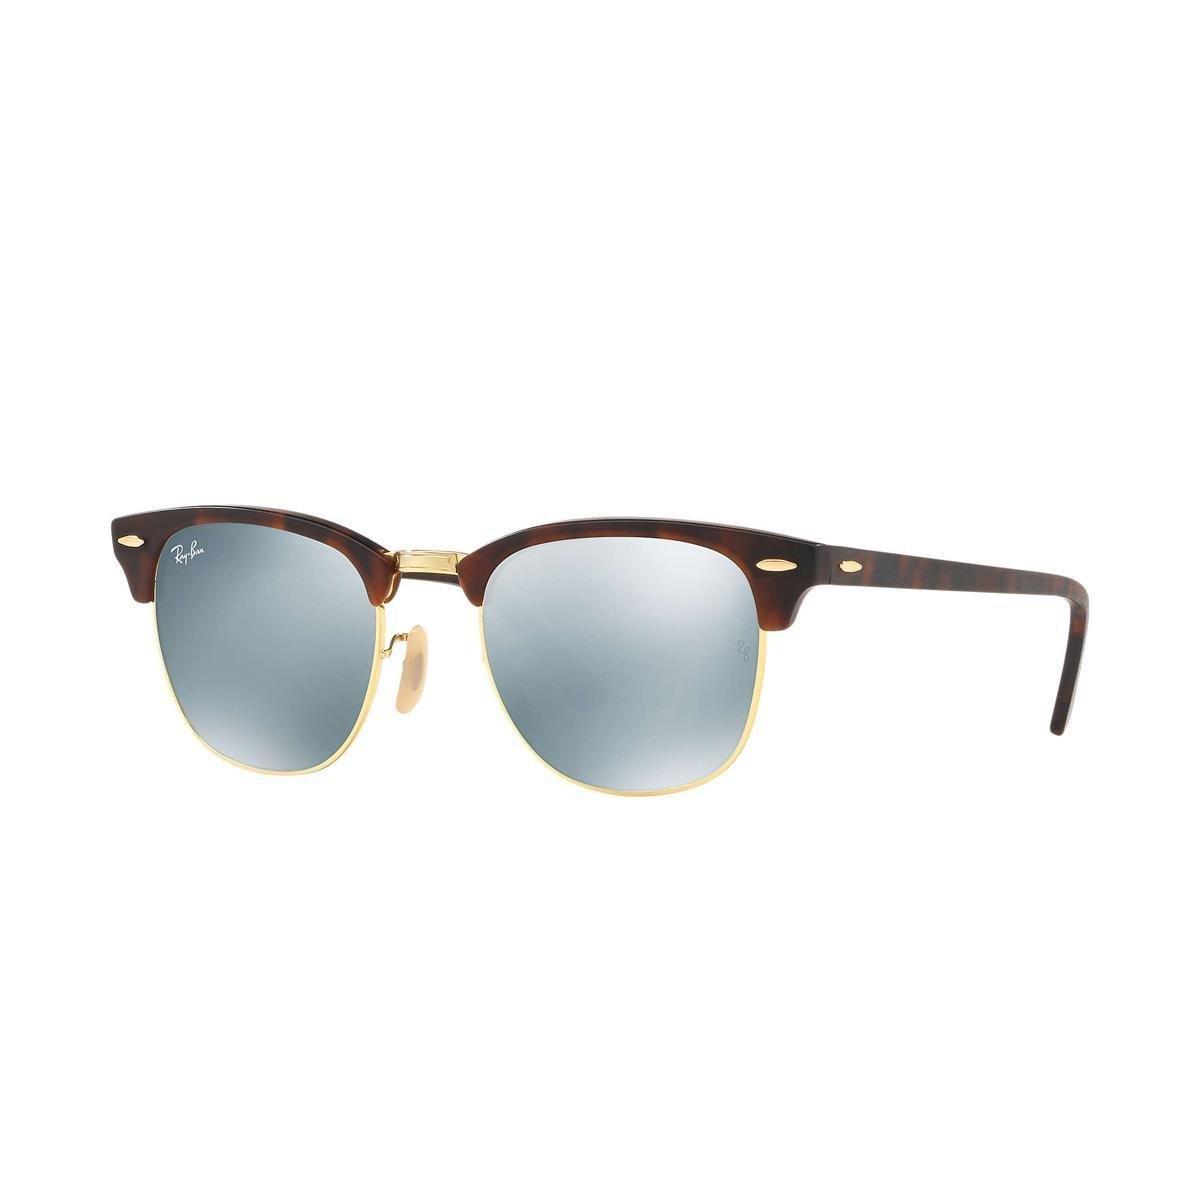 Óculos de Sol Ray-Ban Clubmaster Feminino - Marrom - Compre Agora ... 0d00a2226a